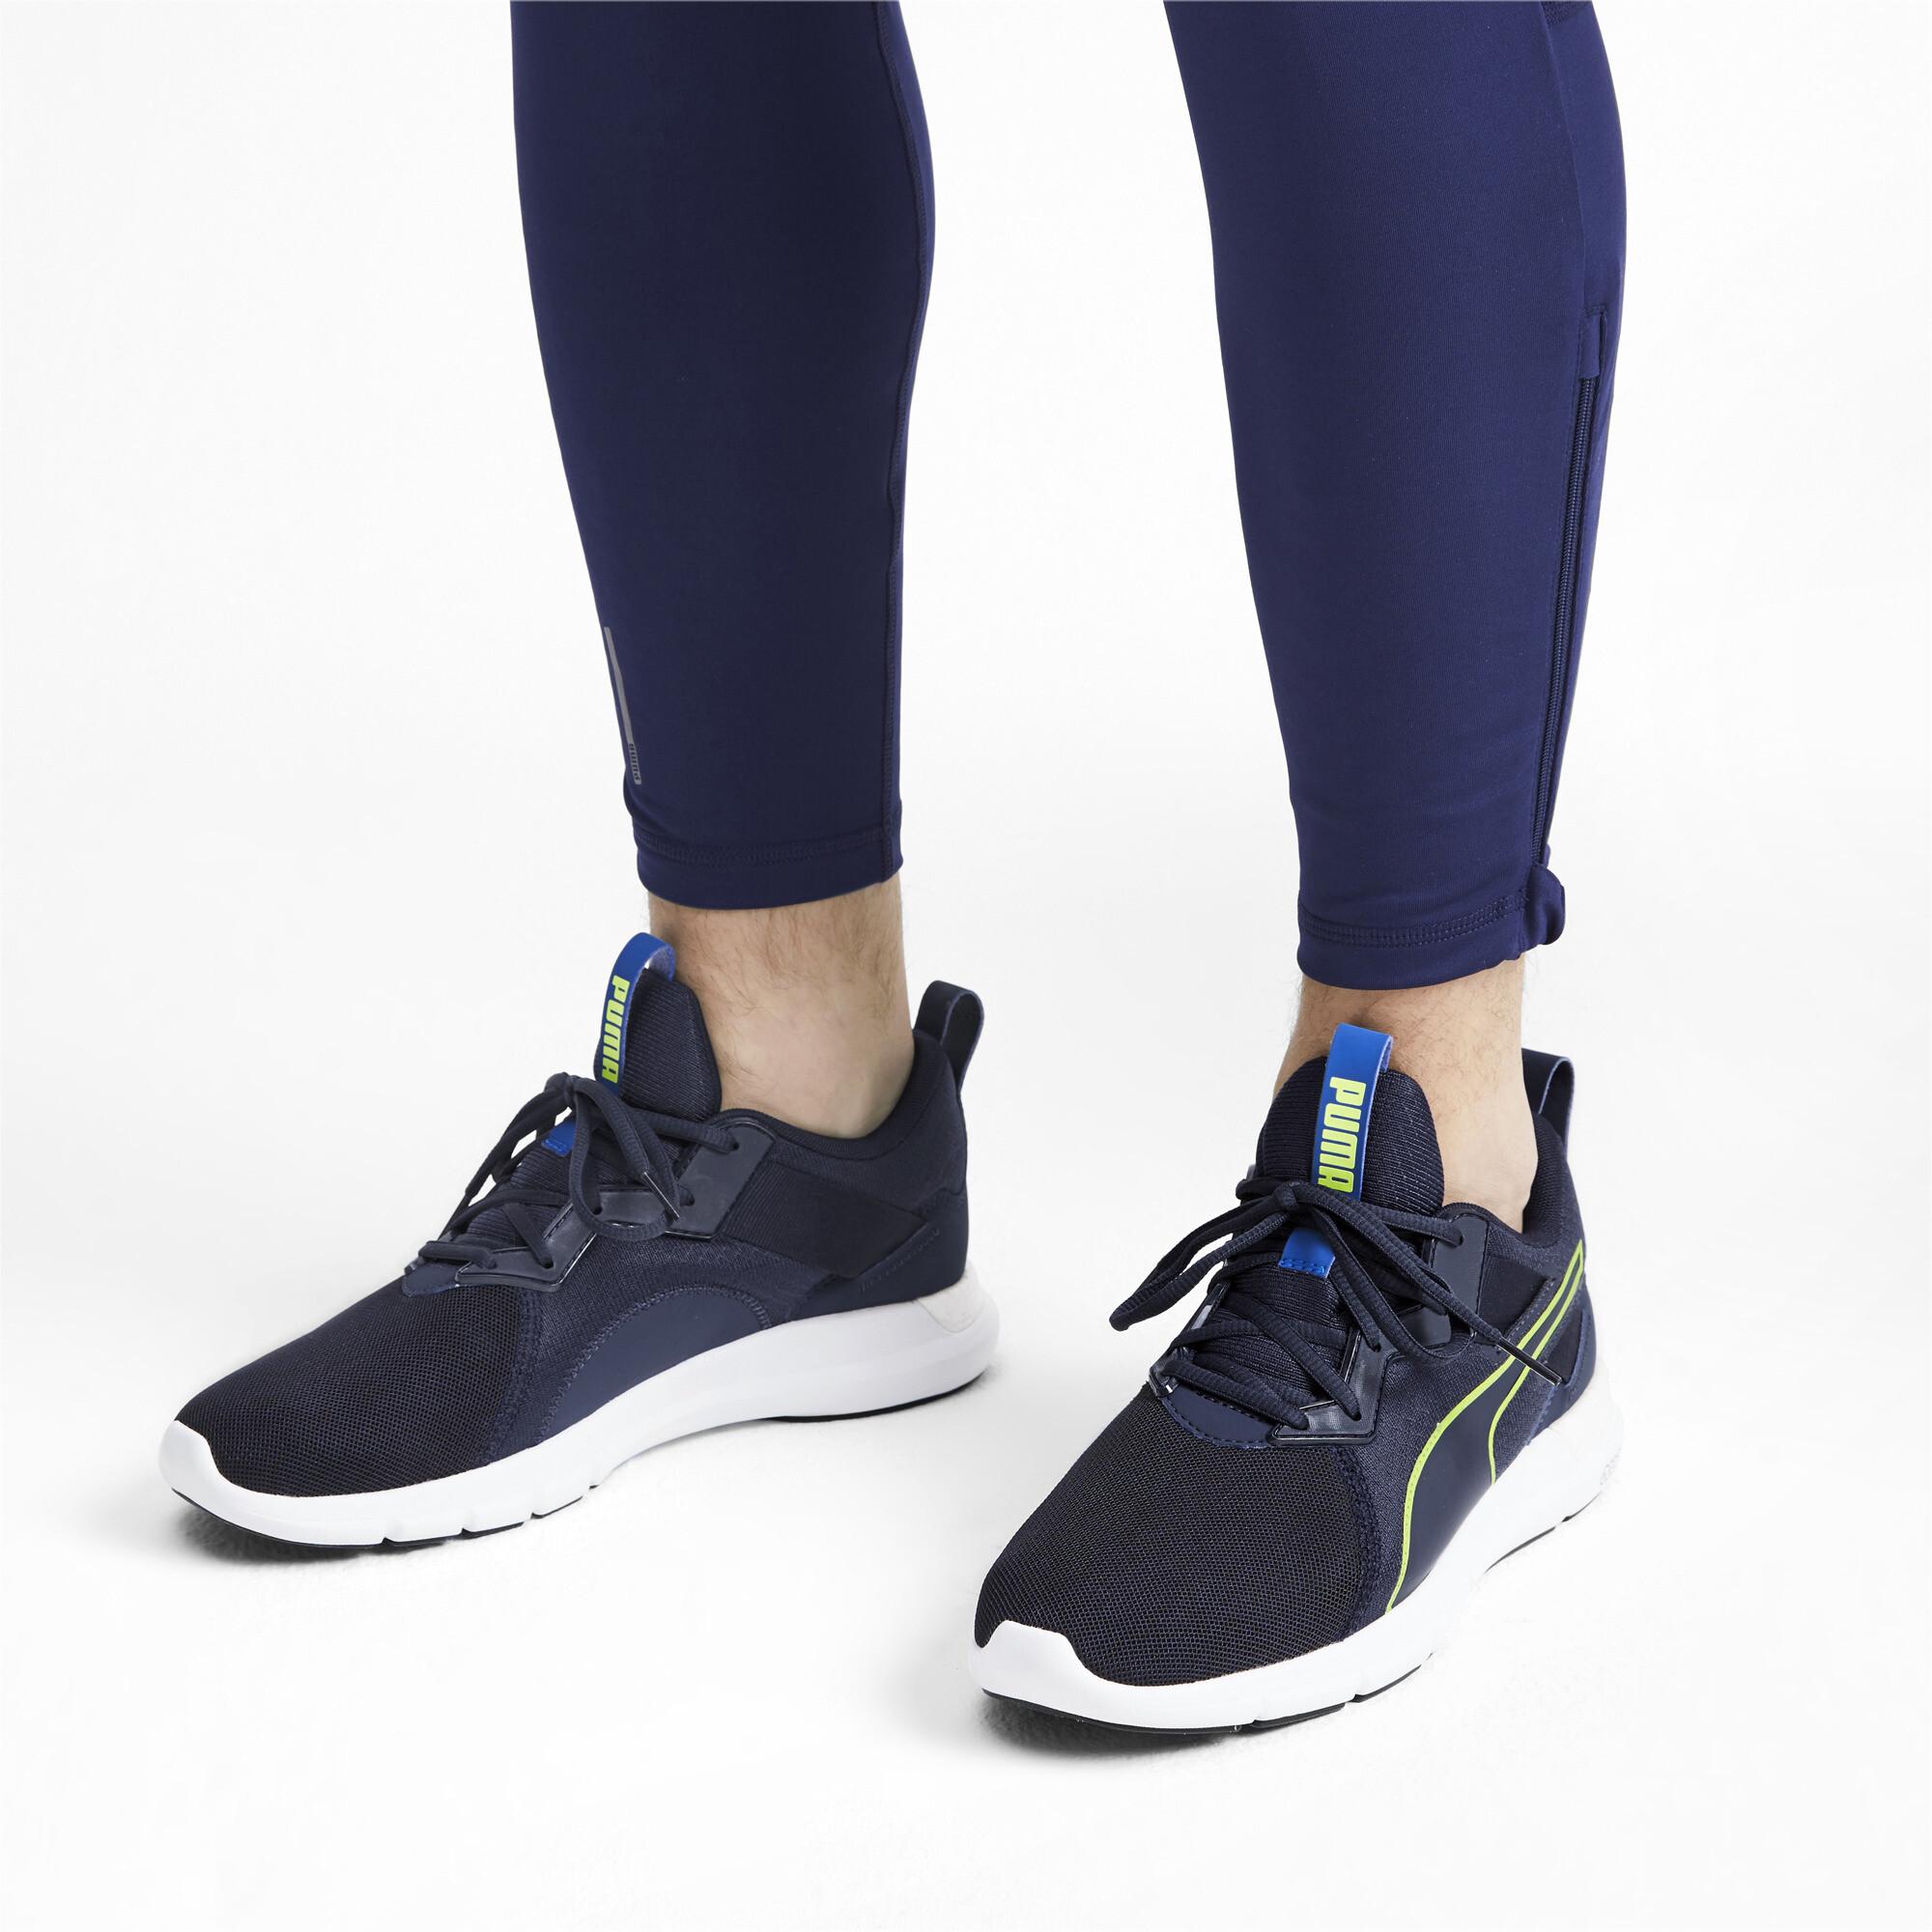 PUMA-NRGY-Dynamo-Futuro-Men-039-s-Running-Shoes-Men-Shoe-Running thumbnail 5